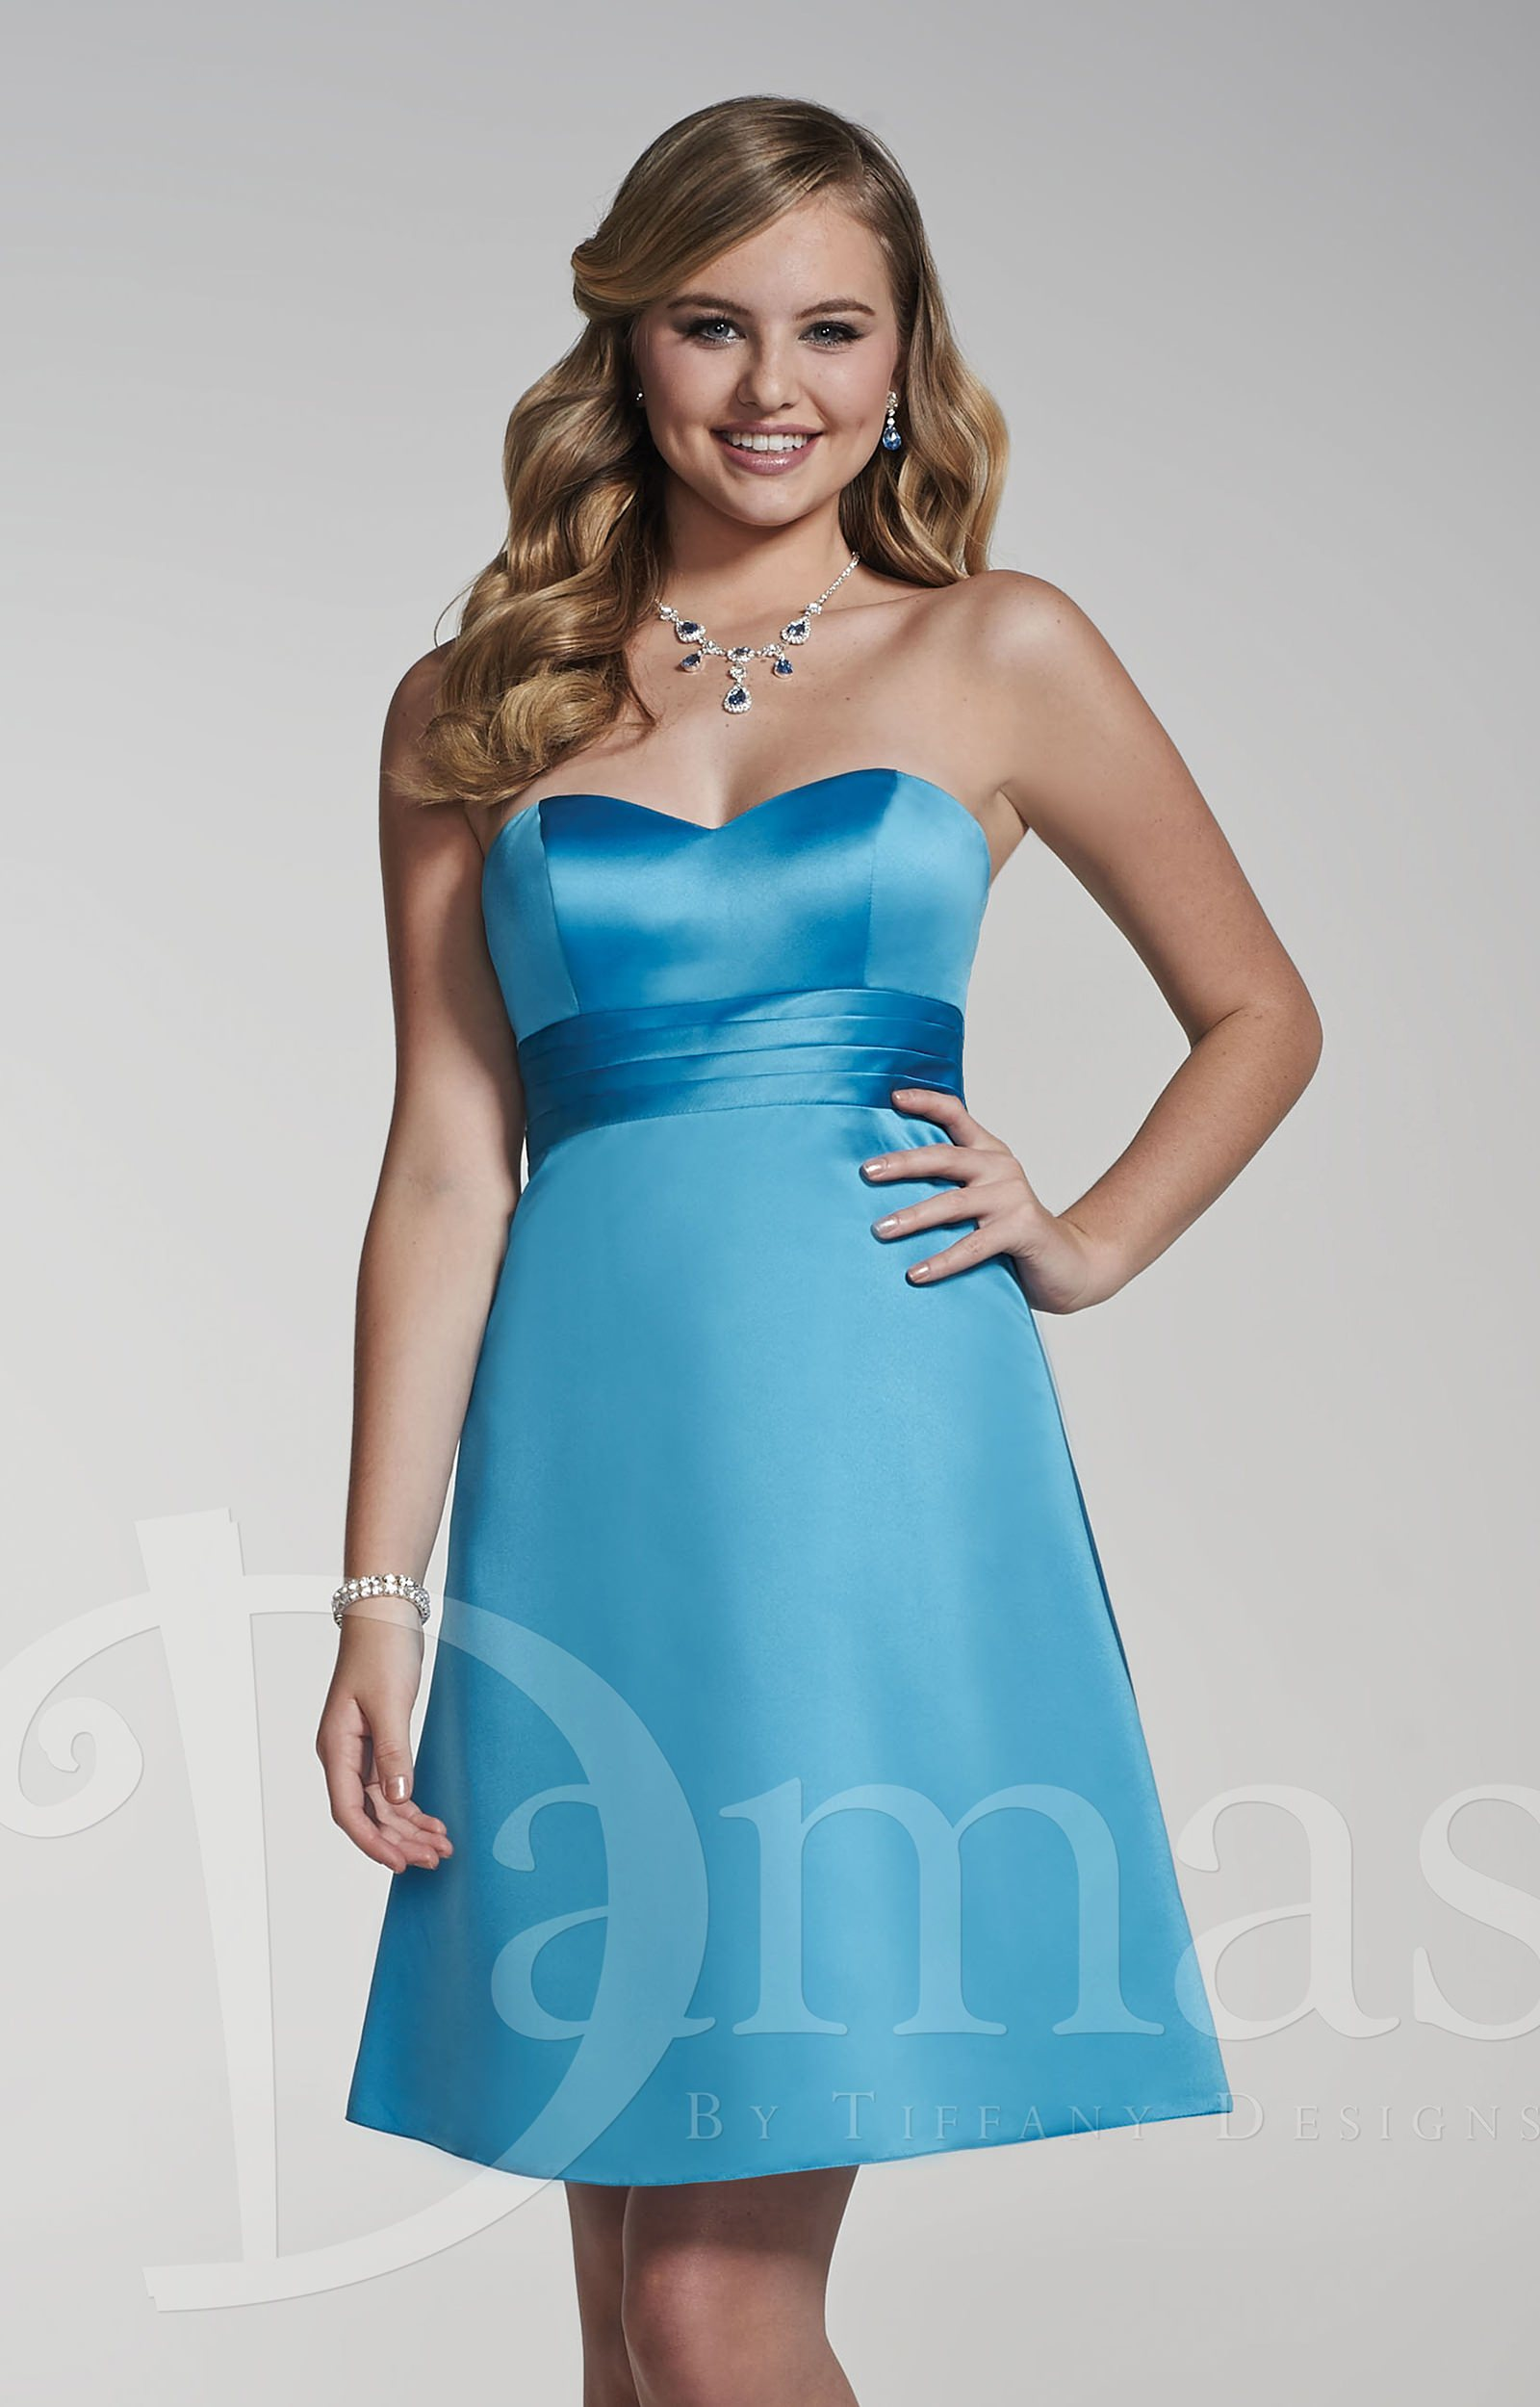 Damas 52313 - The Perfect Bridesmaid Prom Dress